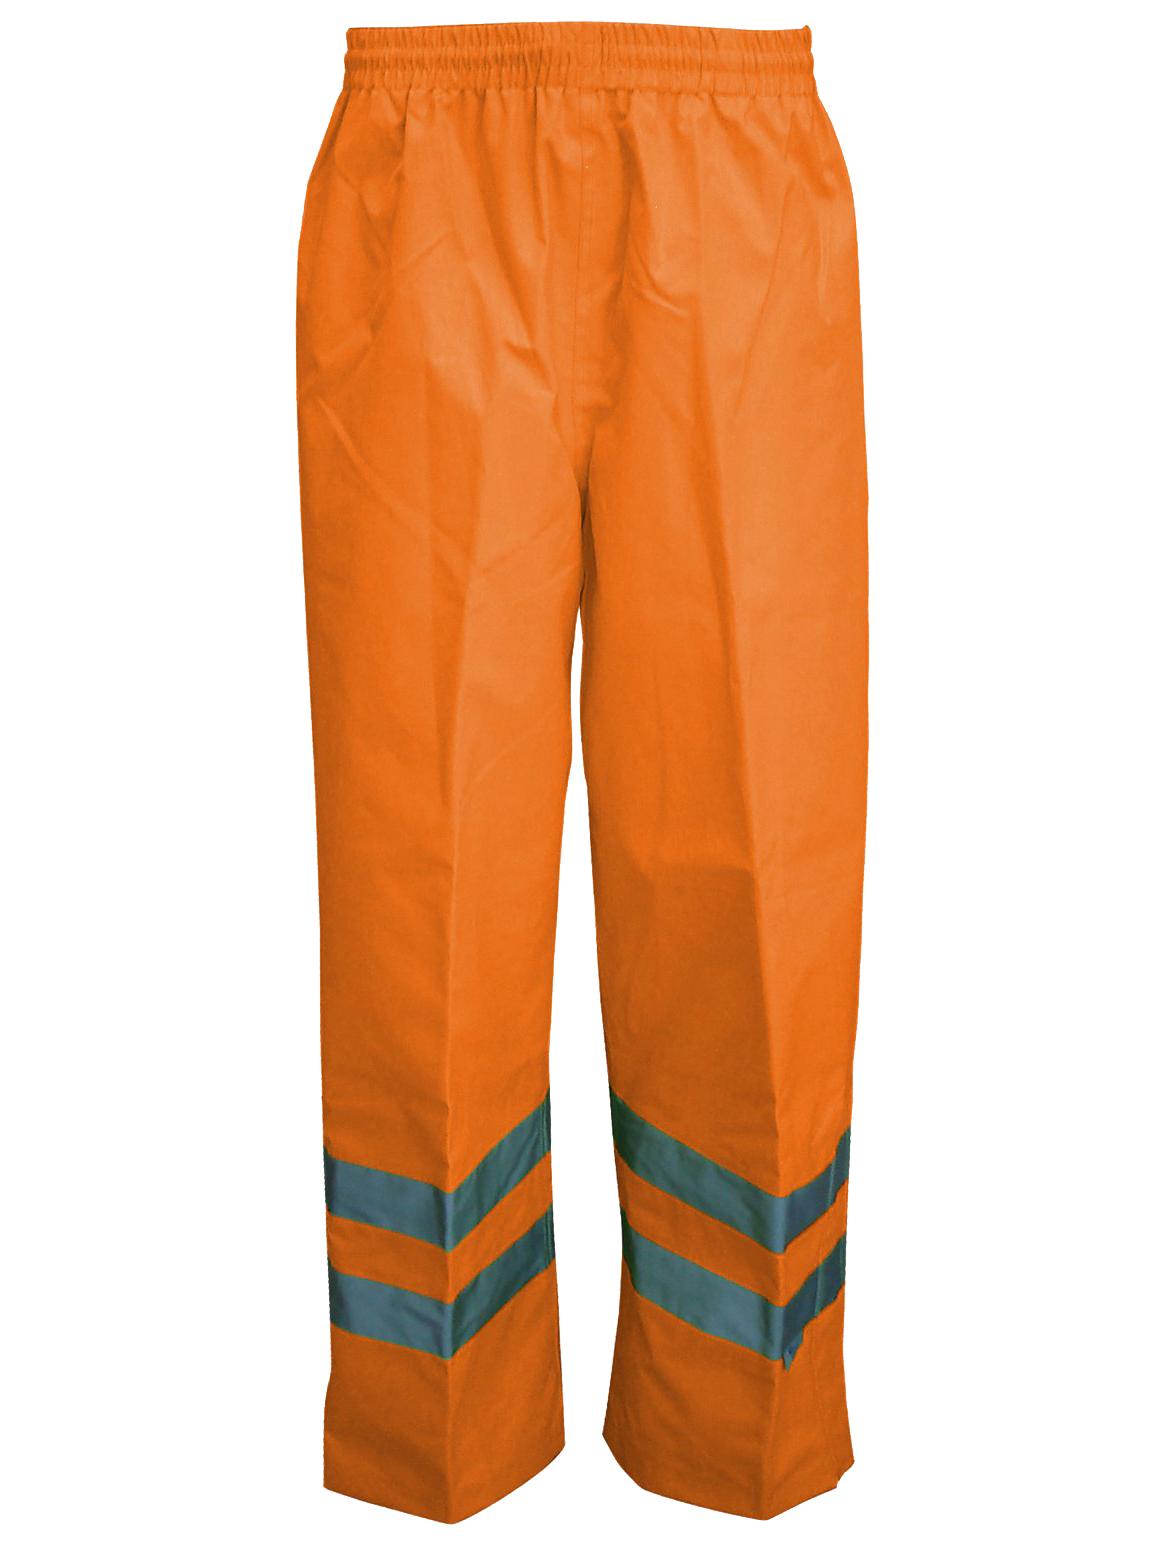 Men's D Series 300D Waist Pant